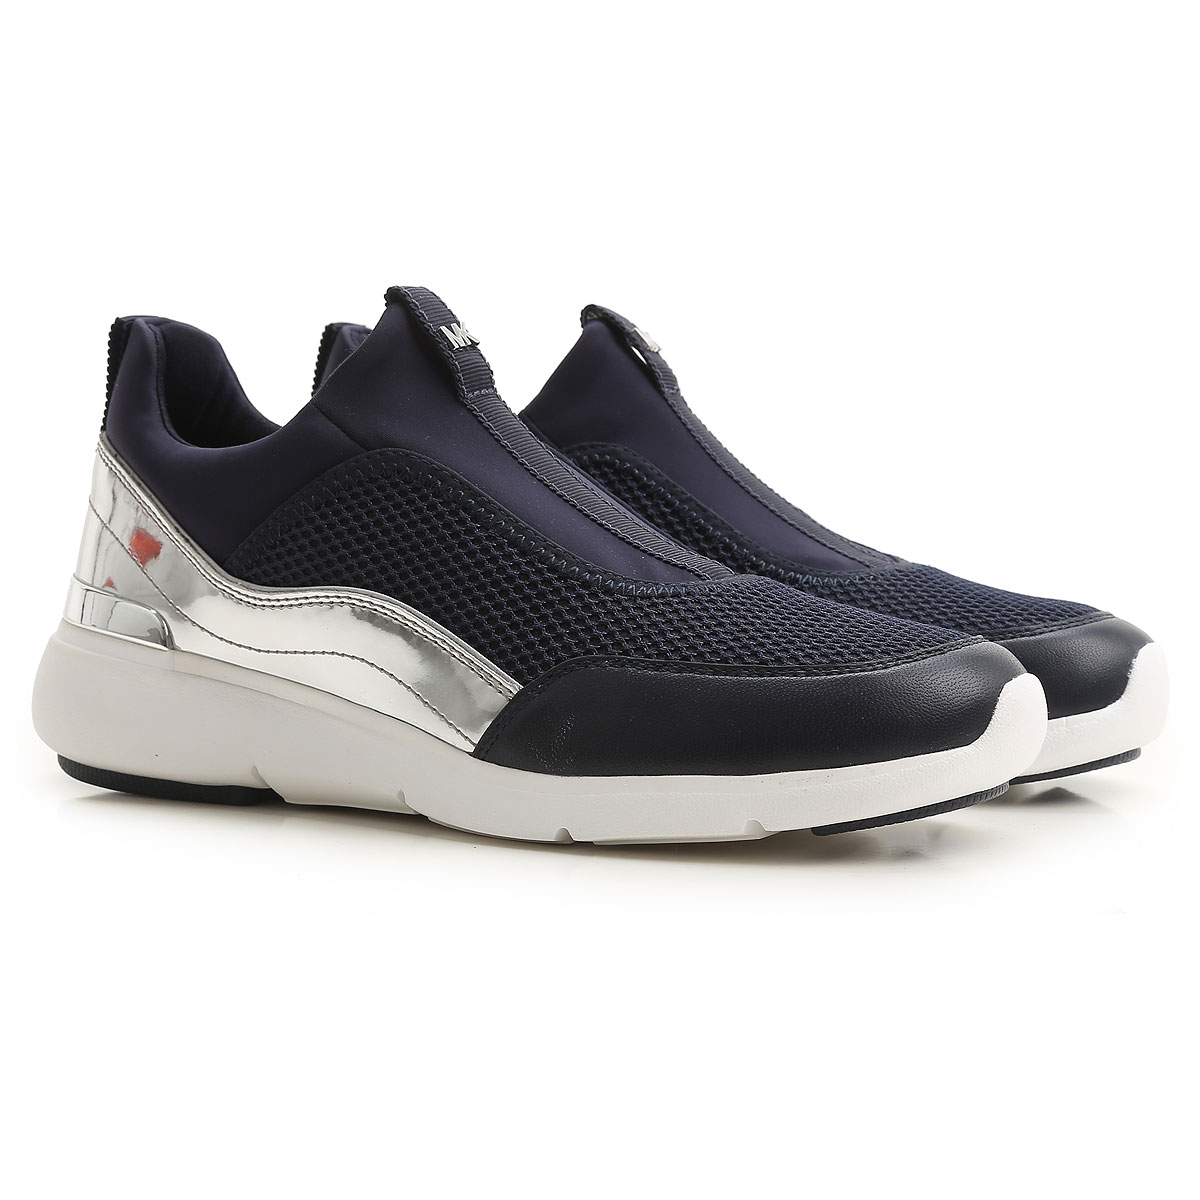 Michael Kors Sneakers for Women On Sale, Admiral Blue, Neoprene, 2017, 4.5